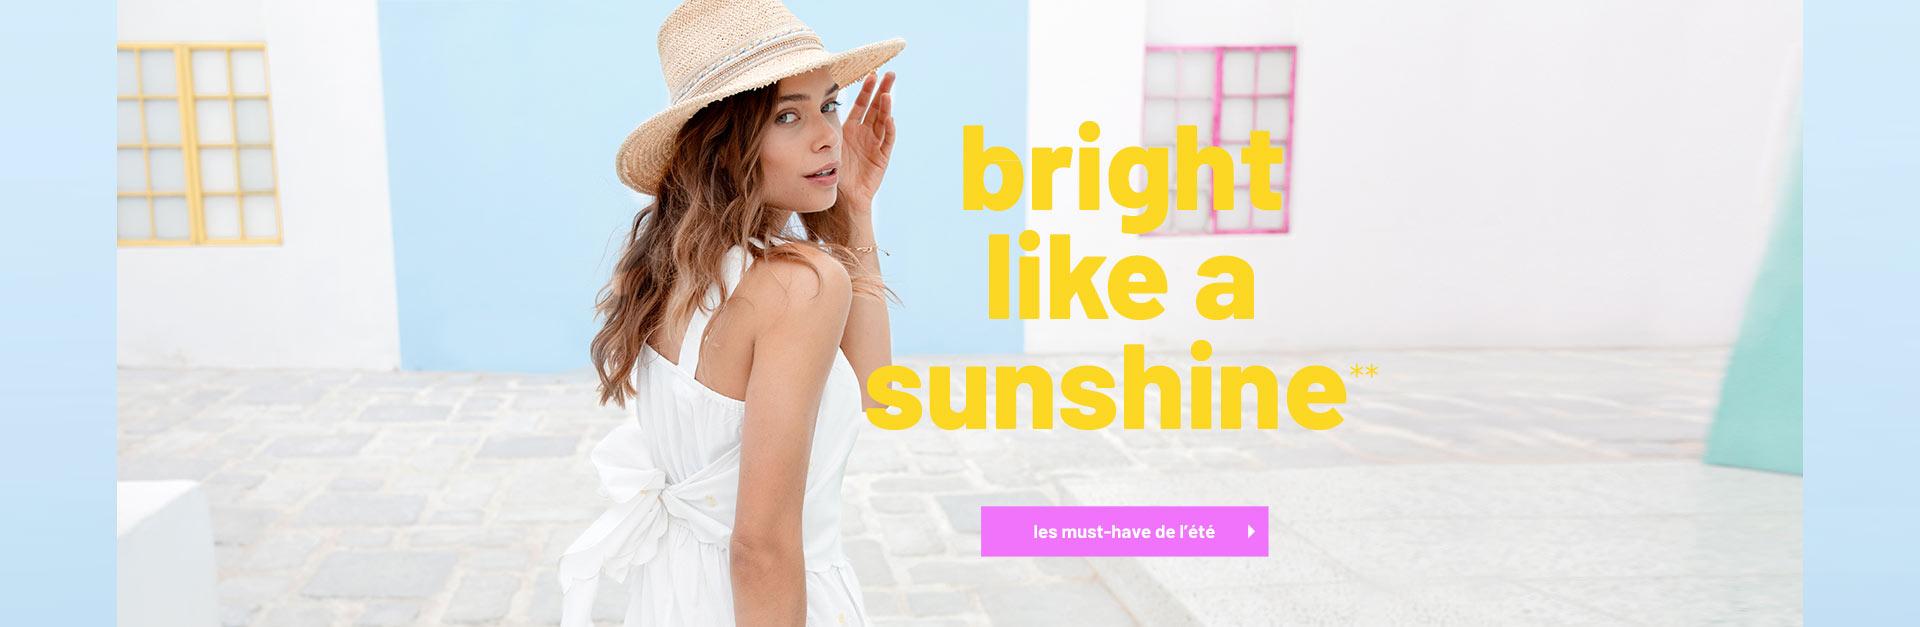 Bright like a sunshine**